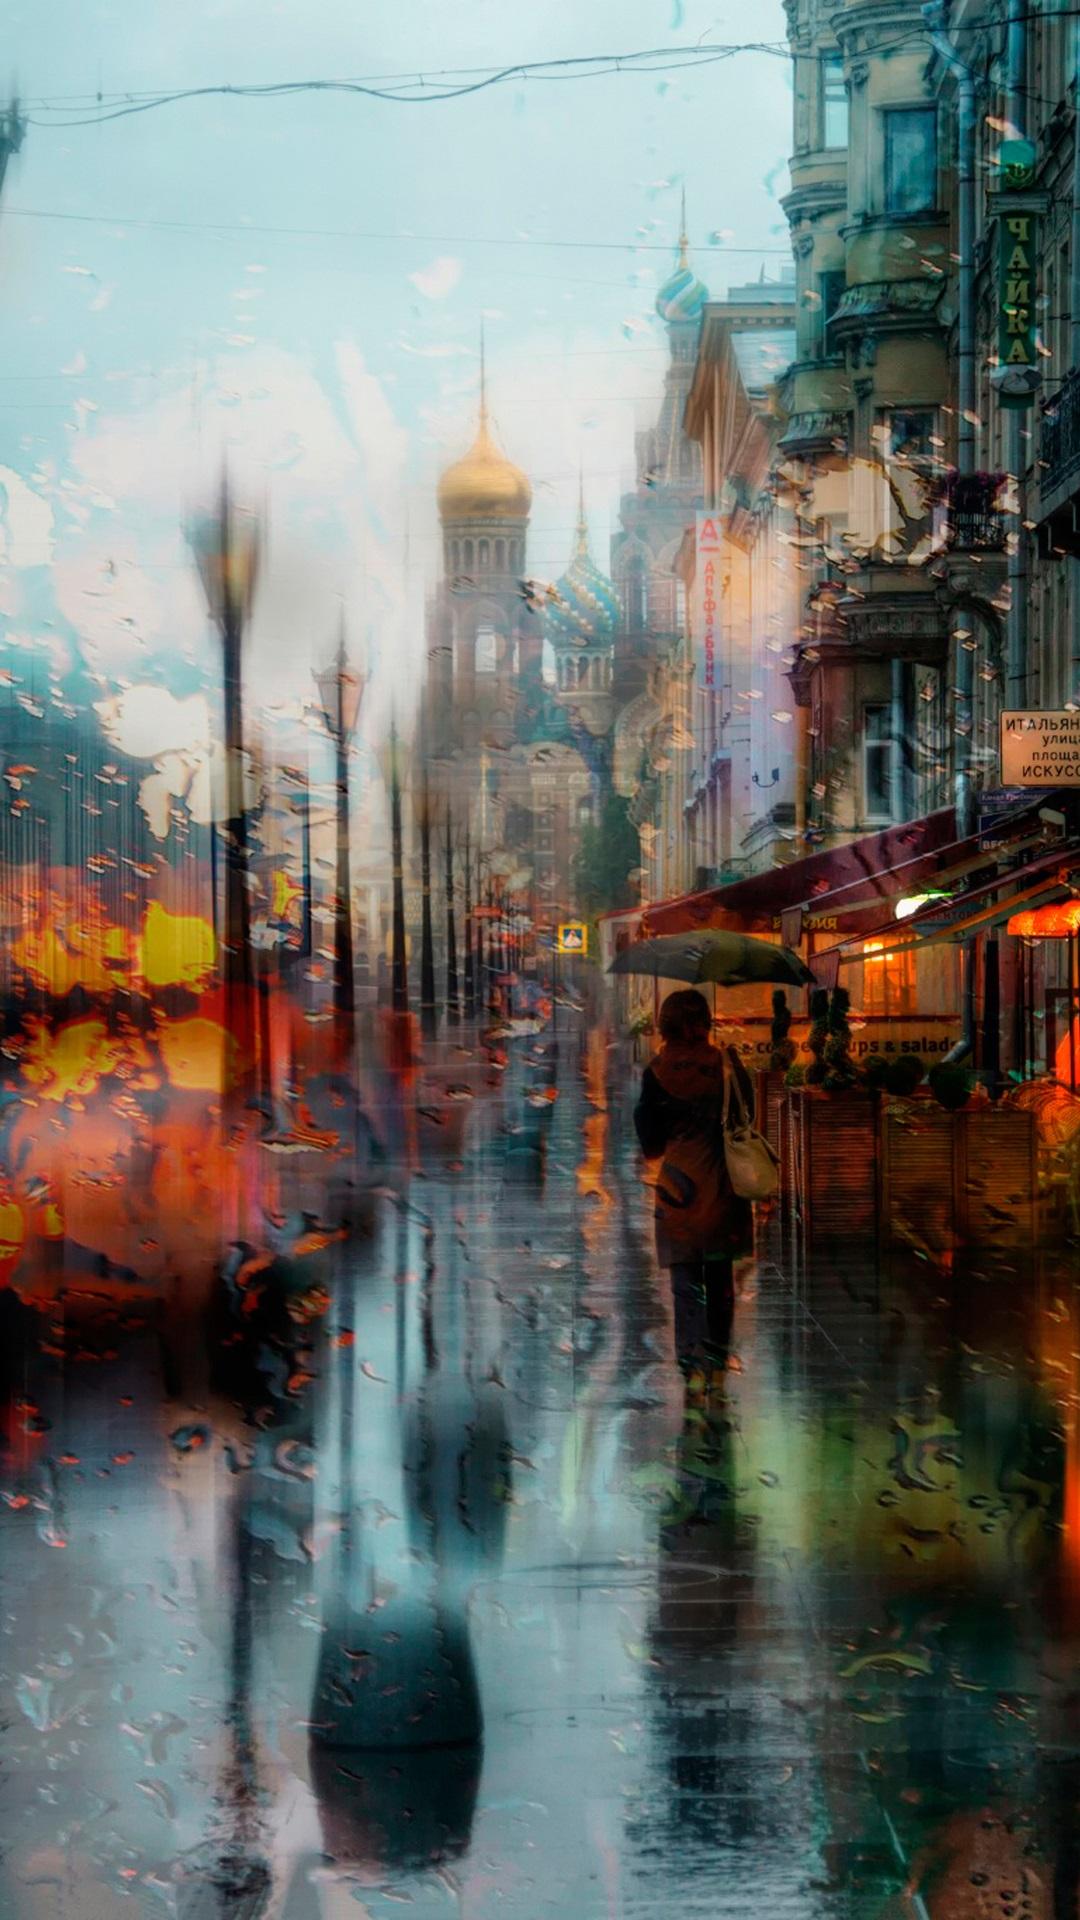 Rainy Day Iphone Wallpaper